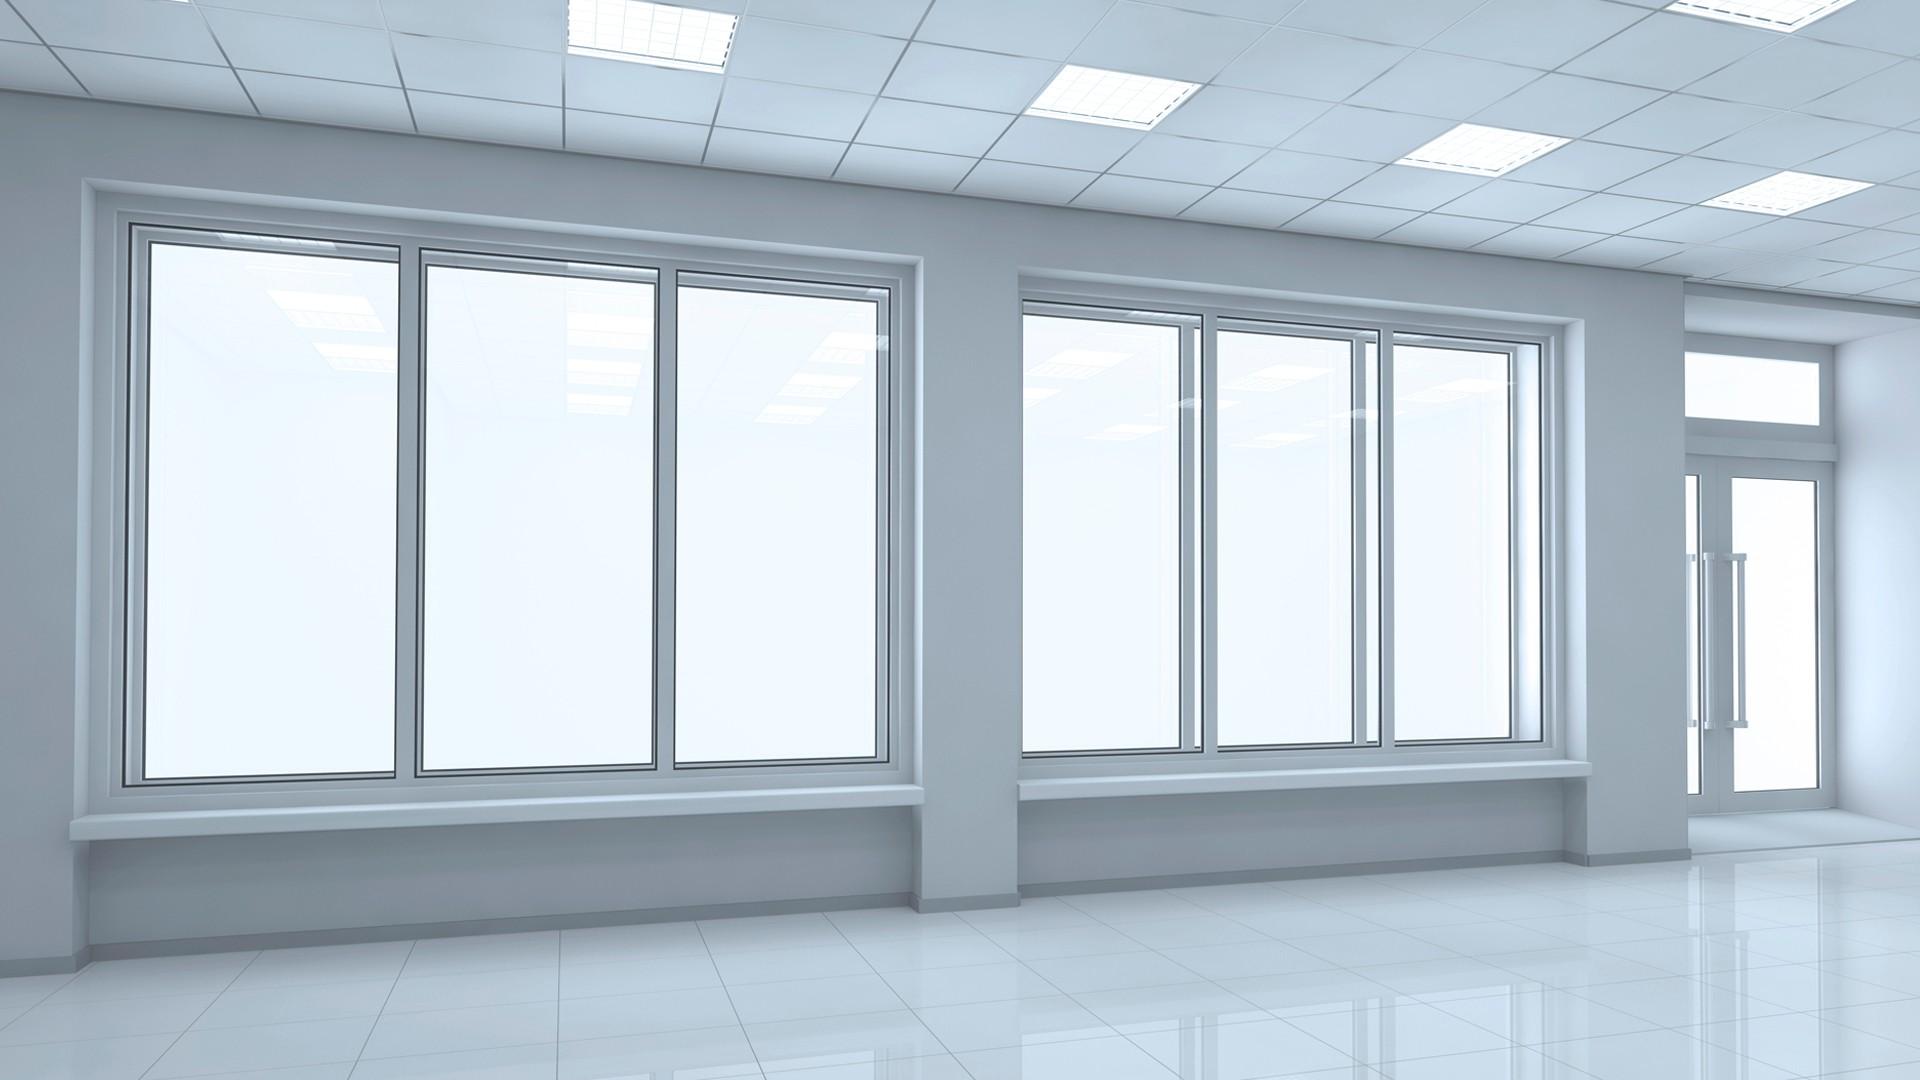 000 aluminio puertas ventanas cerramientos  PVC  (1)